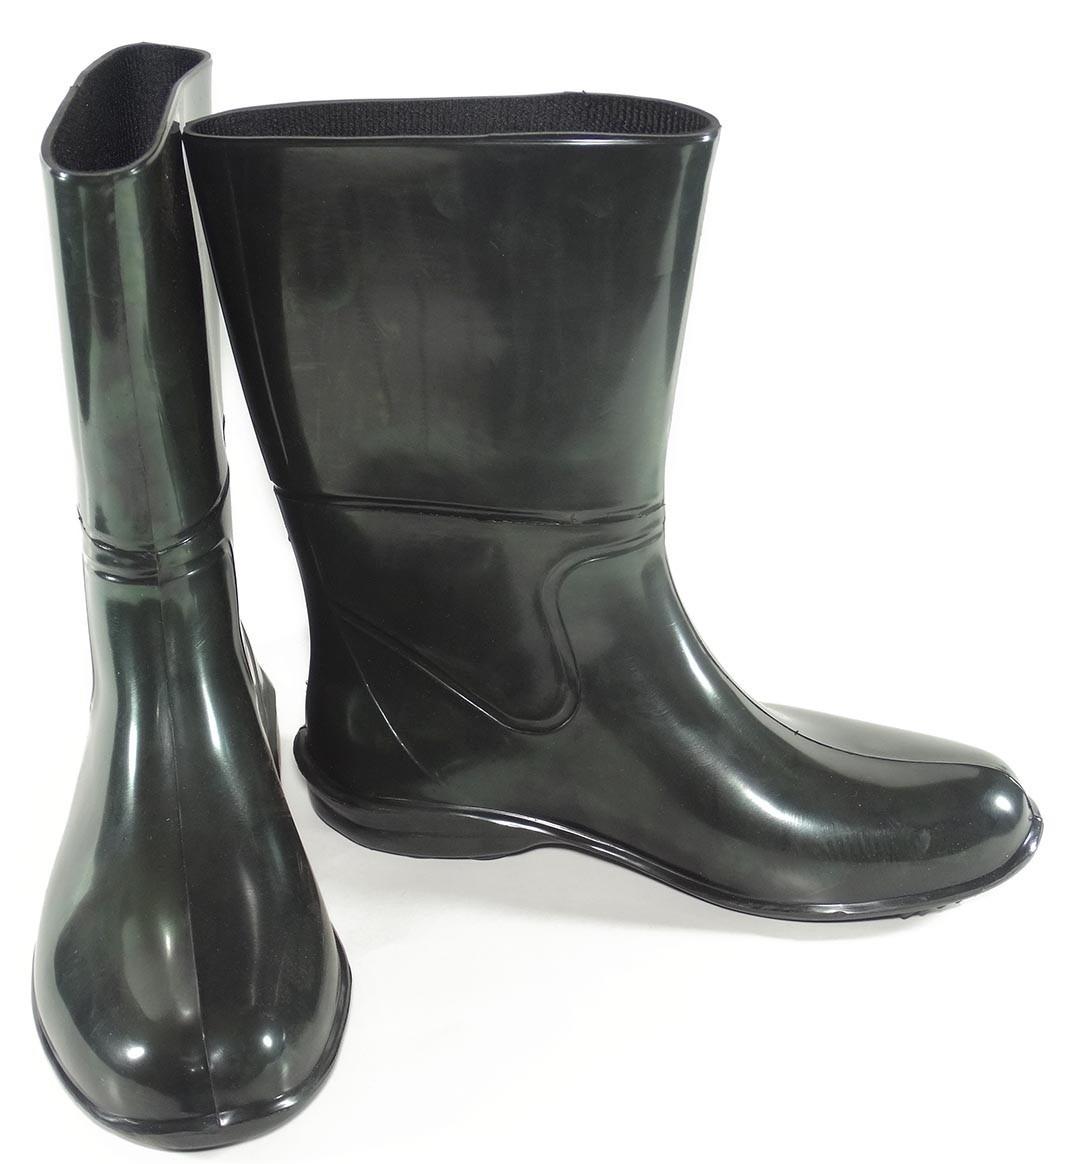 a1296fb3aa6 bota galocha feminina pat jardim cano media limpeza 30062. Carregando zoom...  bota galocha pat. Carregando zoom.